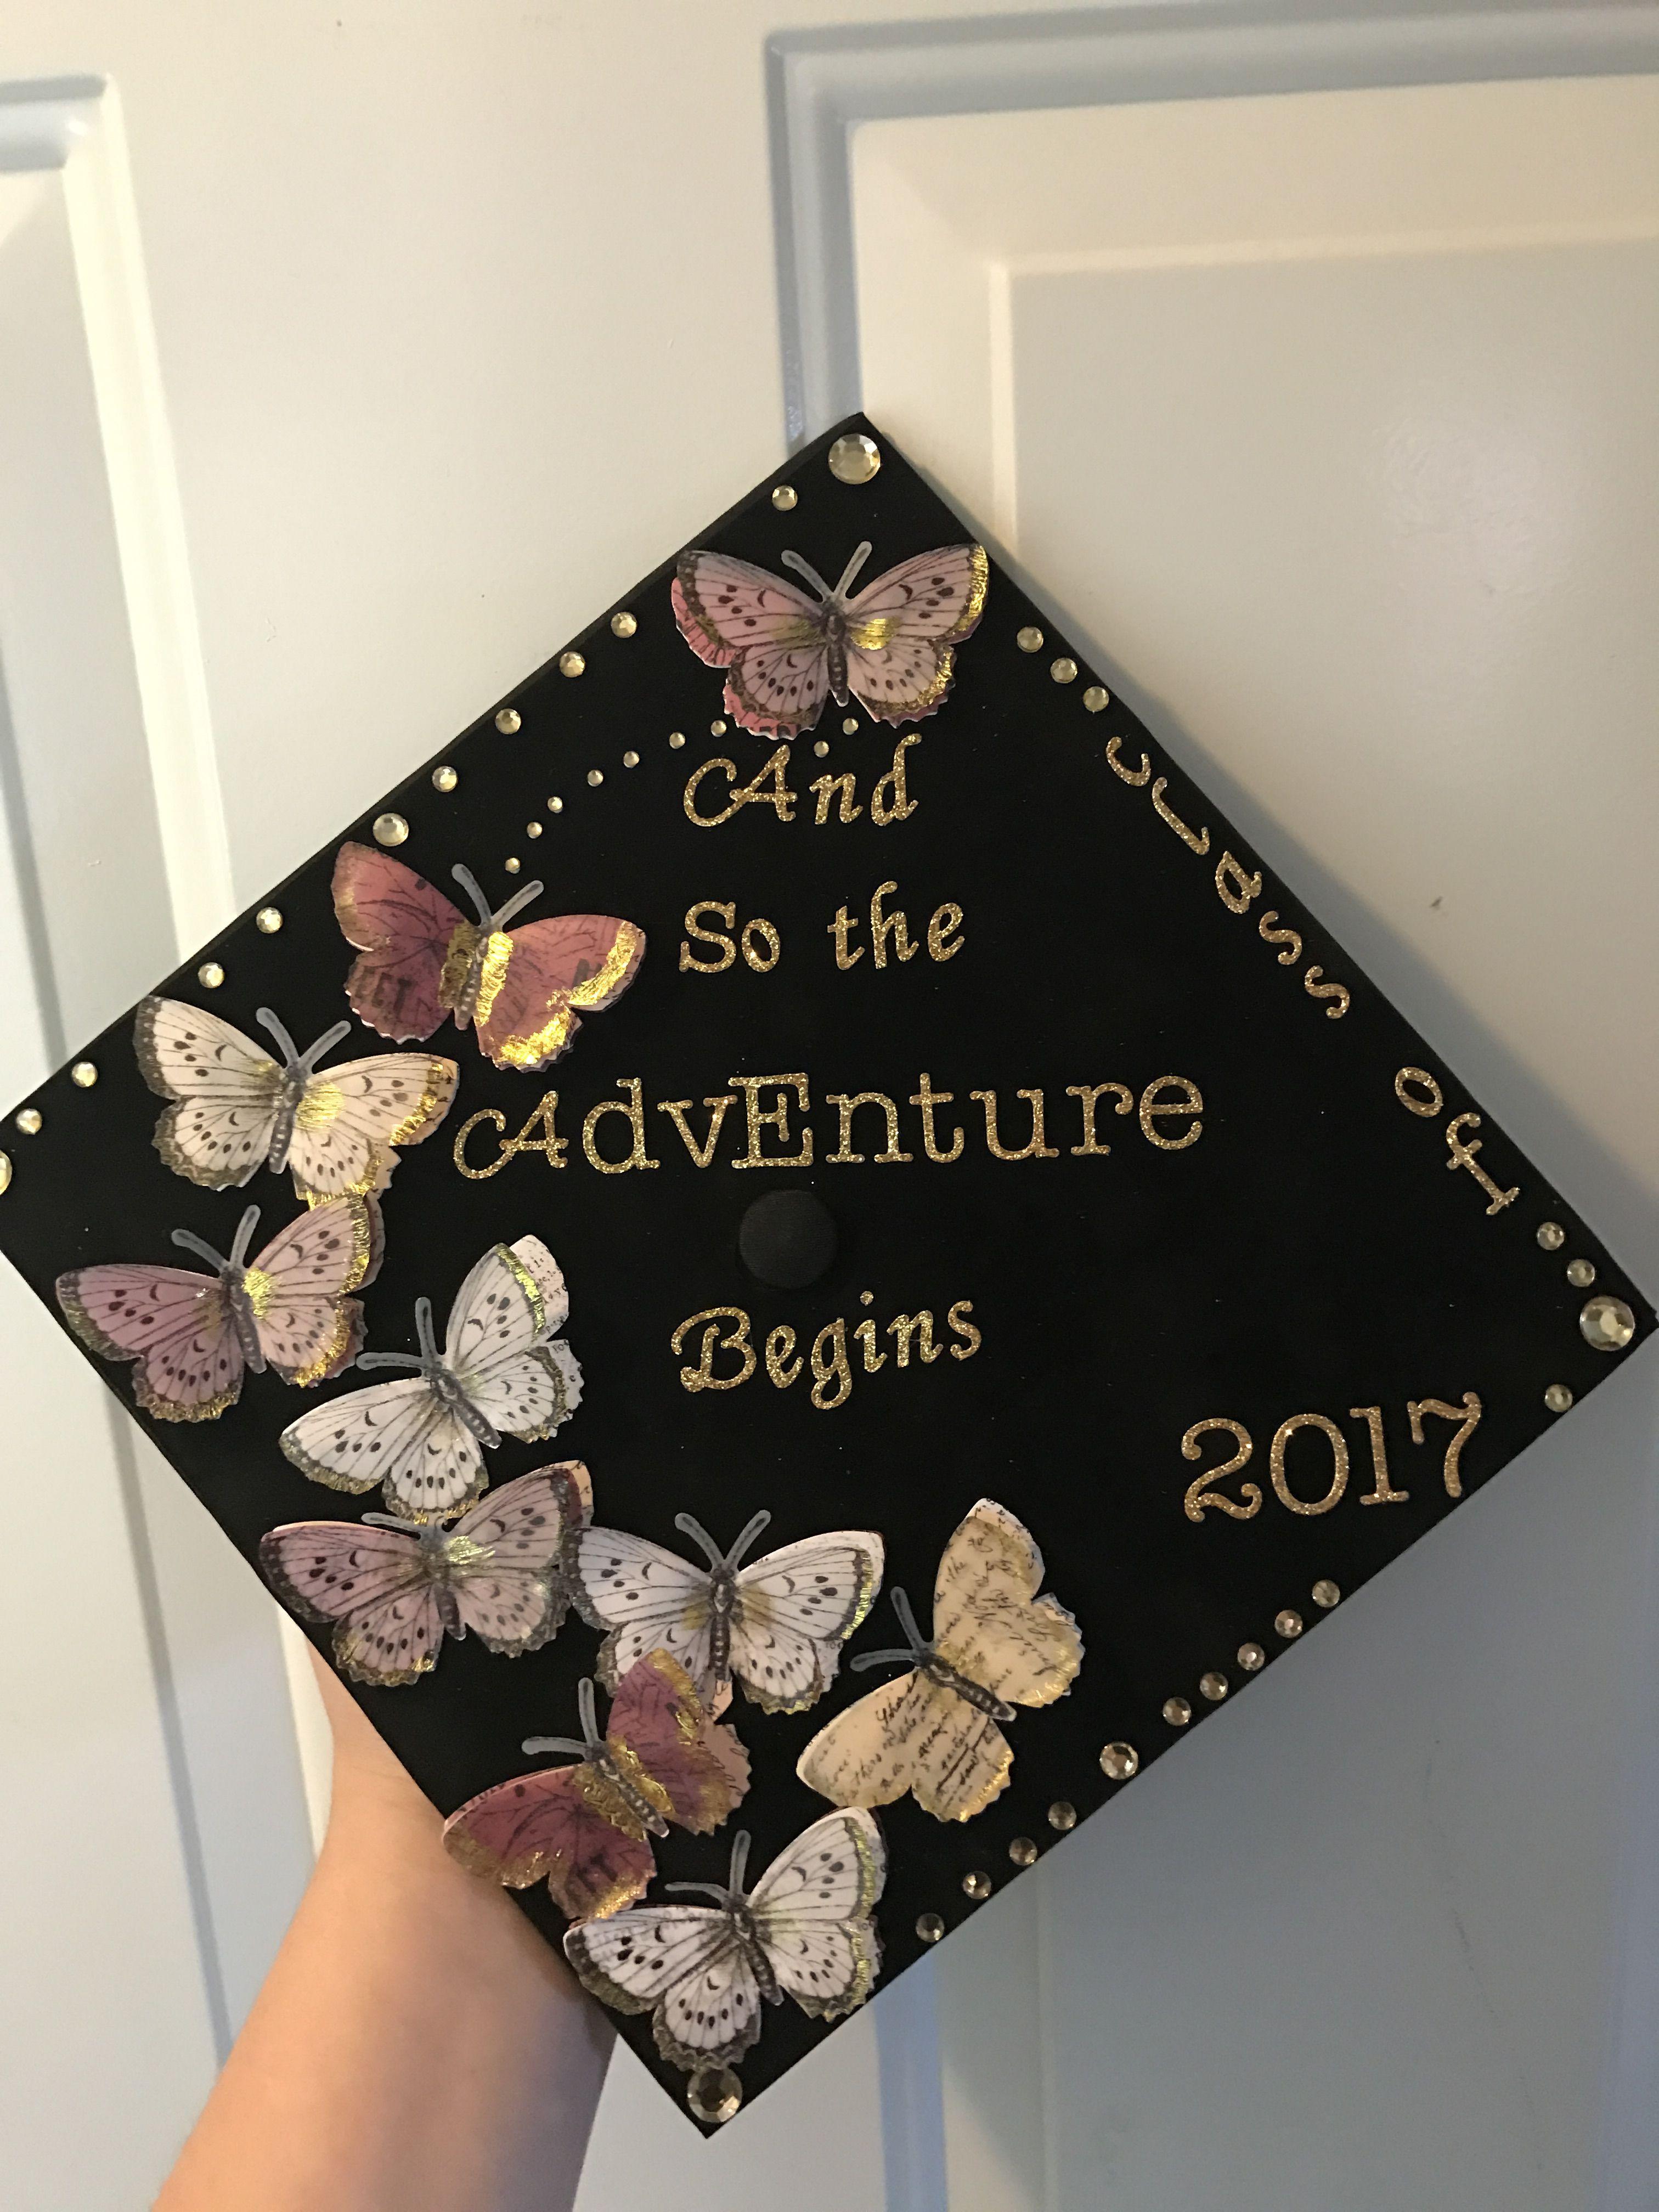 Nice Graduation Cap Black So Adventure Begins Graduation Cap Black Sale So Decorated Graduation Caps S Decorated Graduation Caps ideas Decorated Graduation Caps